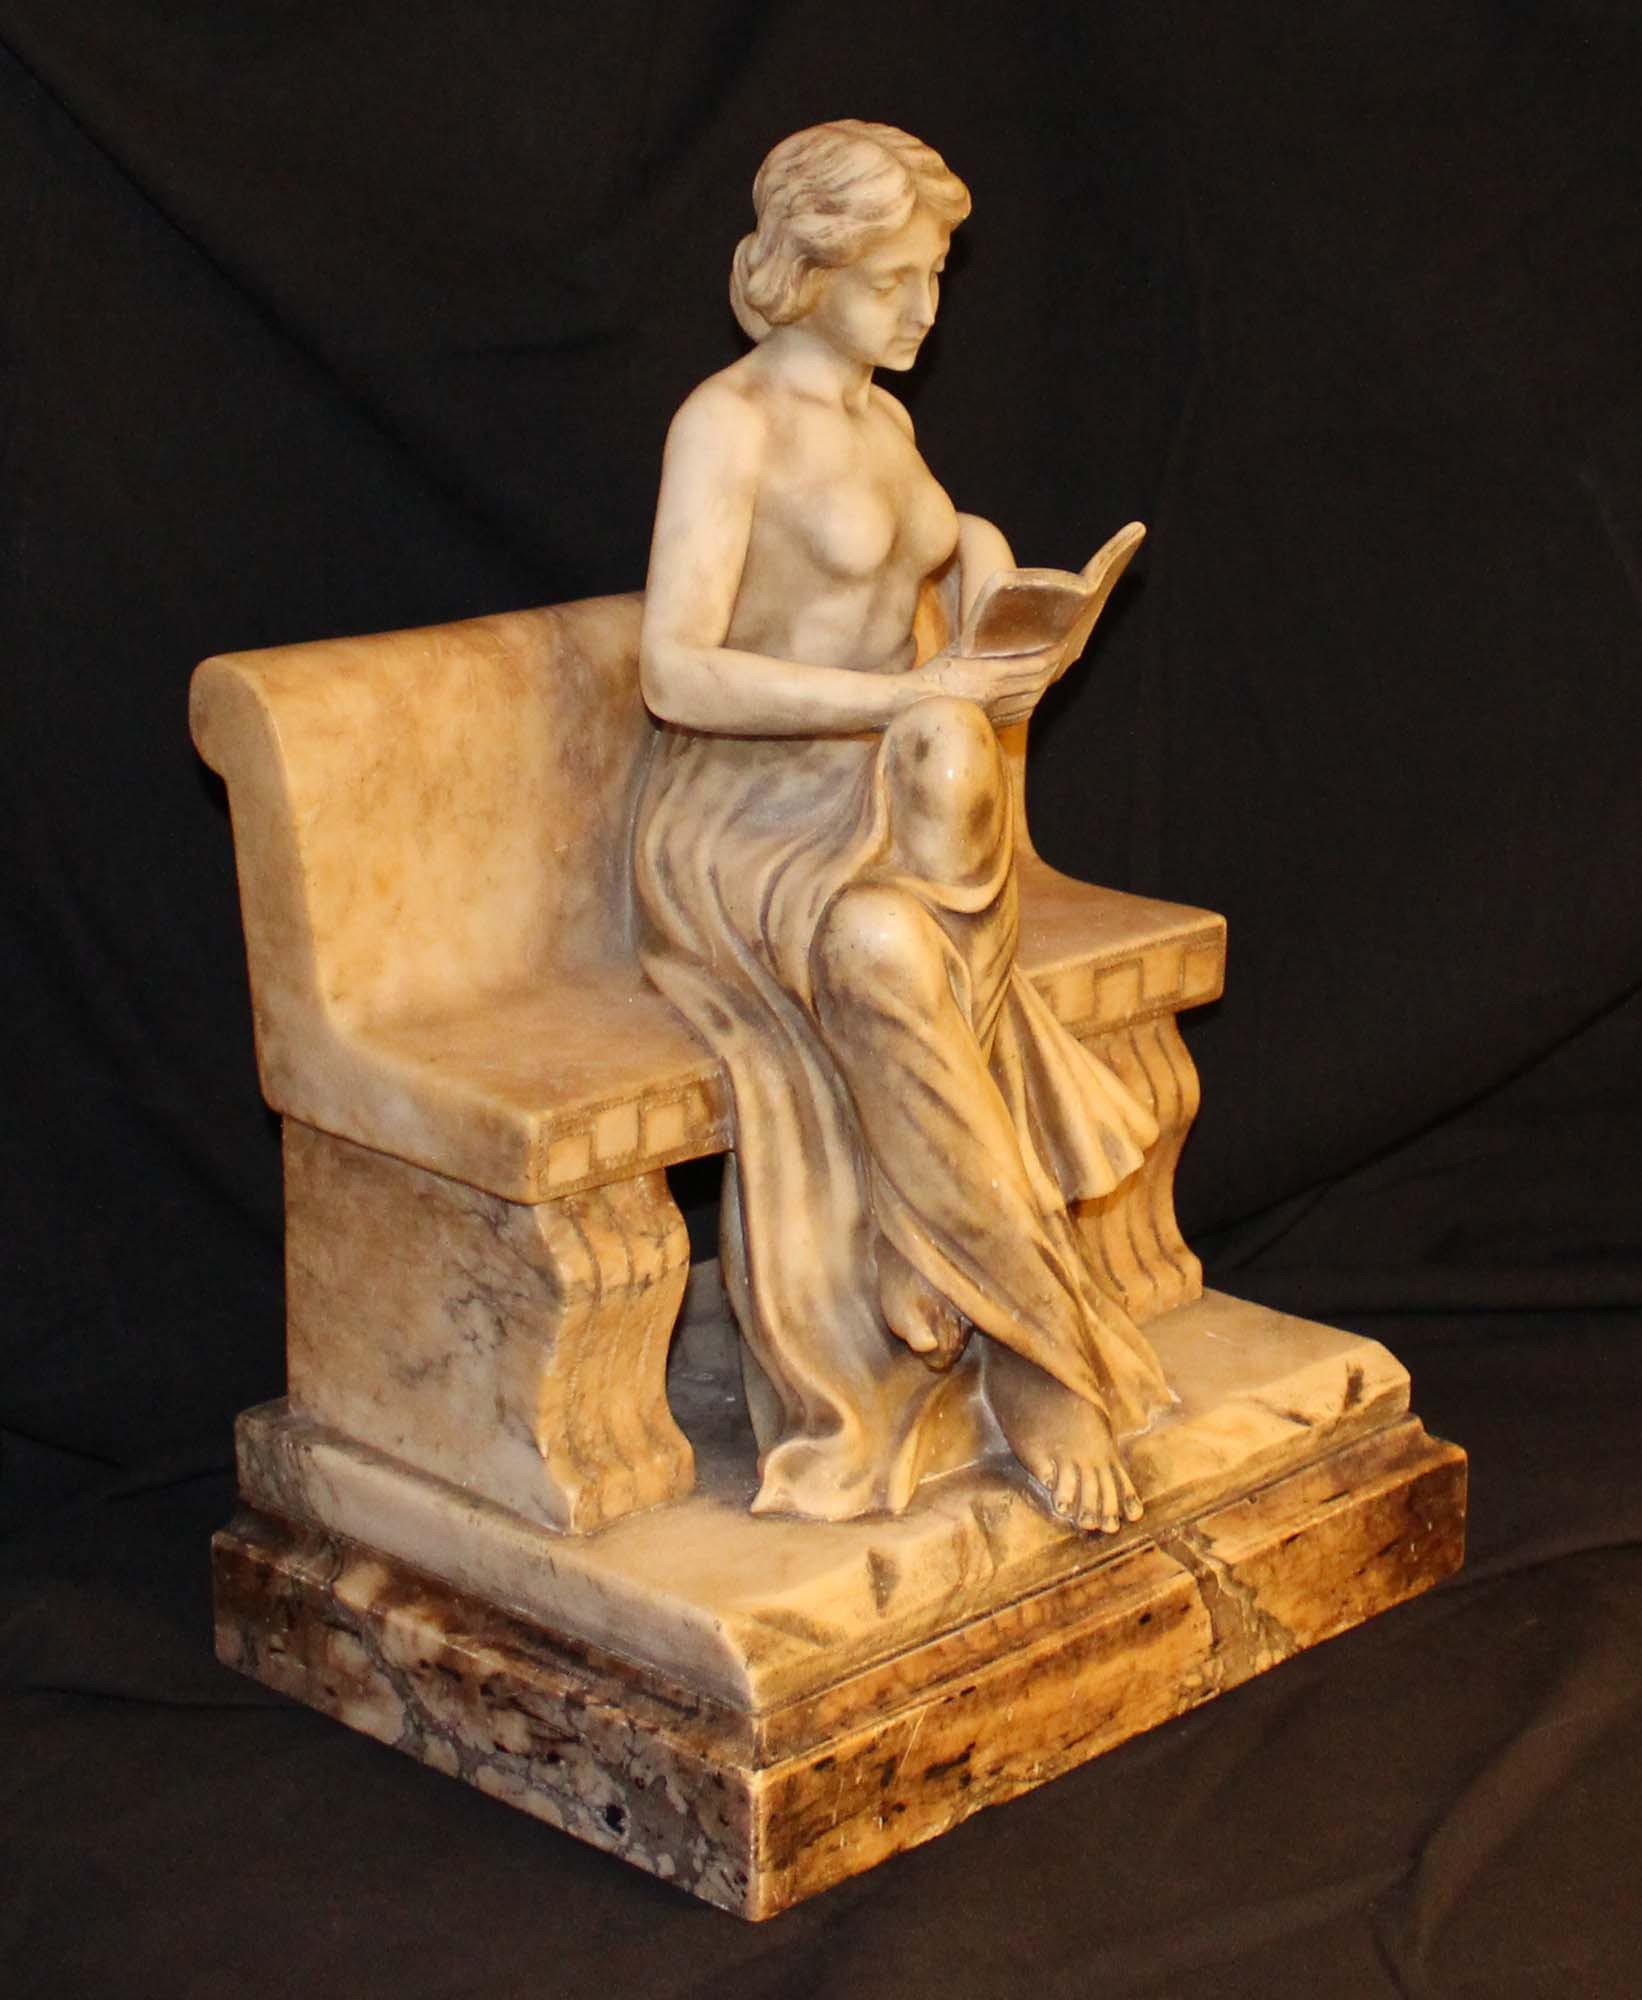 galerie-bosetti-antiquites sculpture marbre profil droit